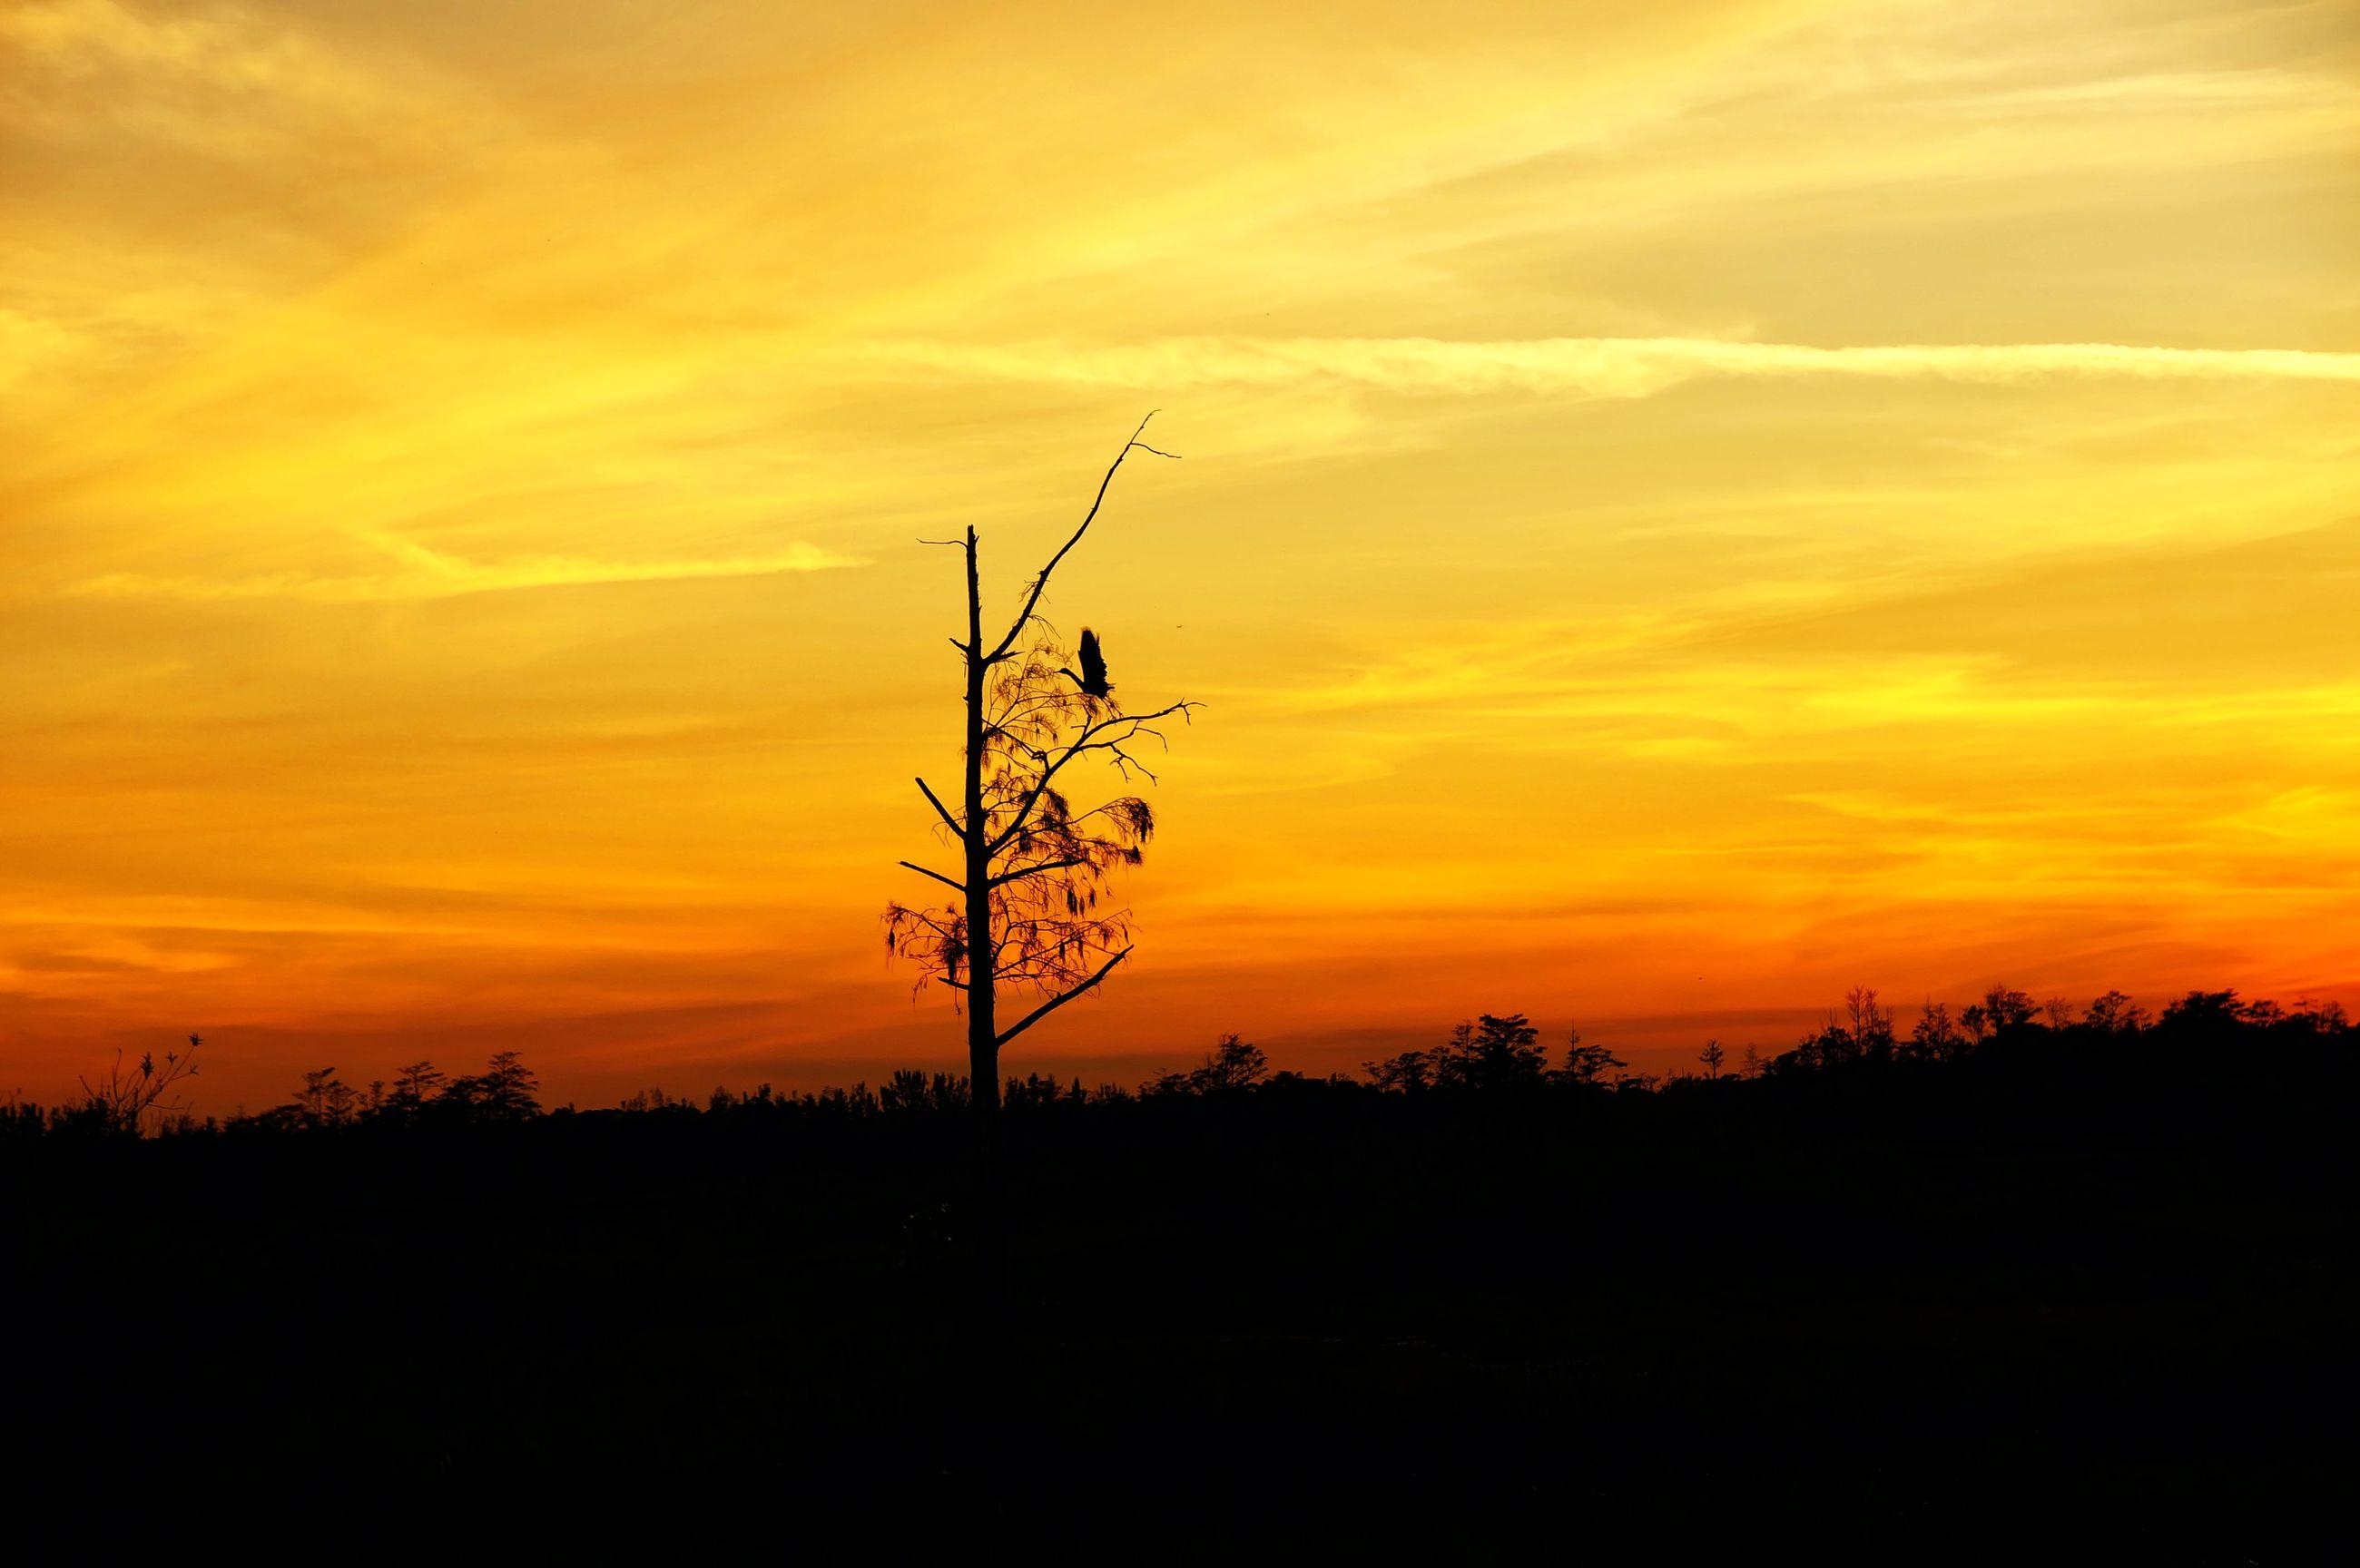 SILHOUETTE PLANTS ON LAND AGAINST ORANGE SKY